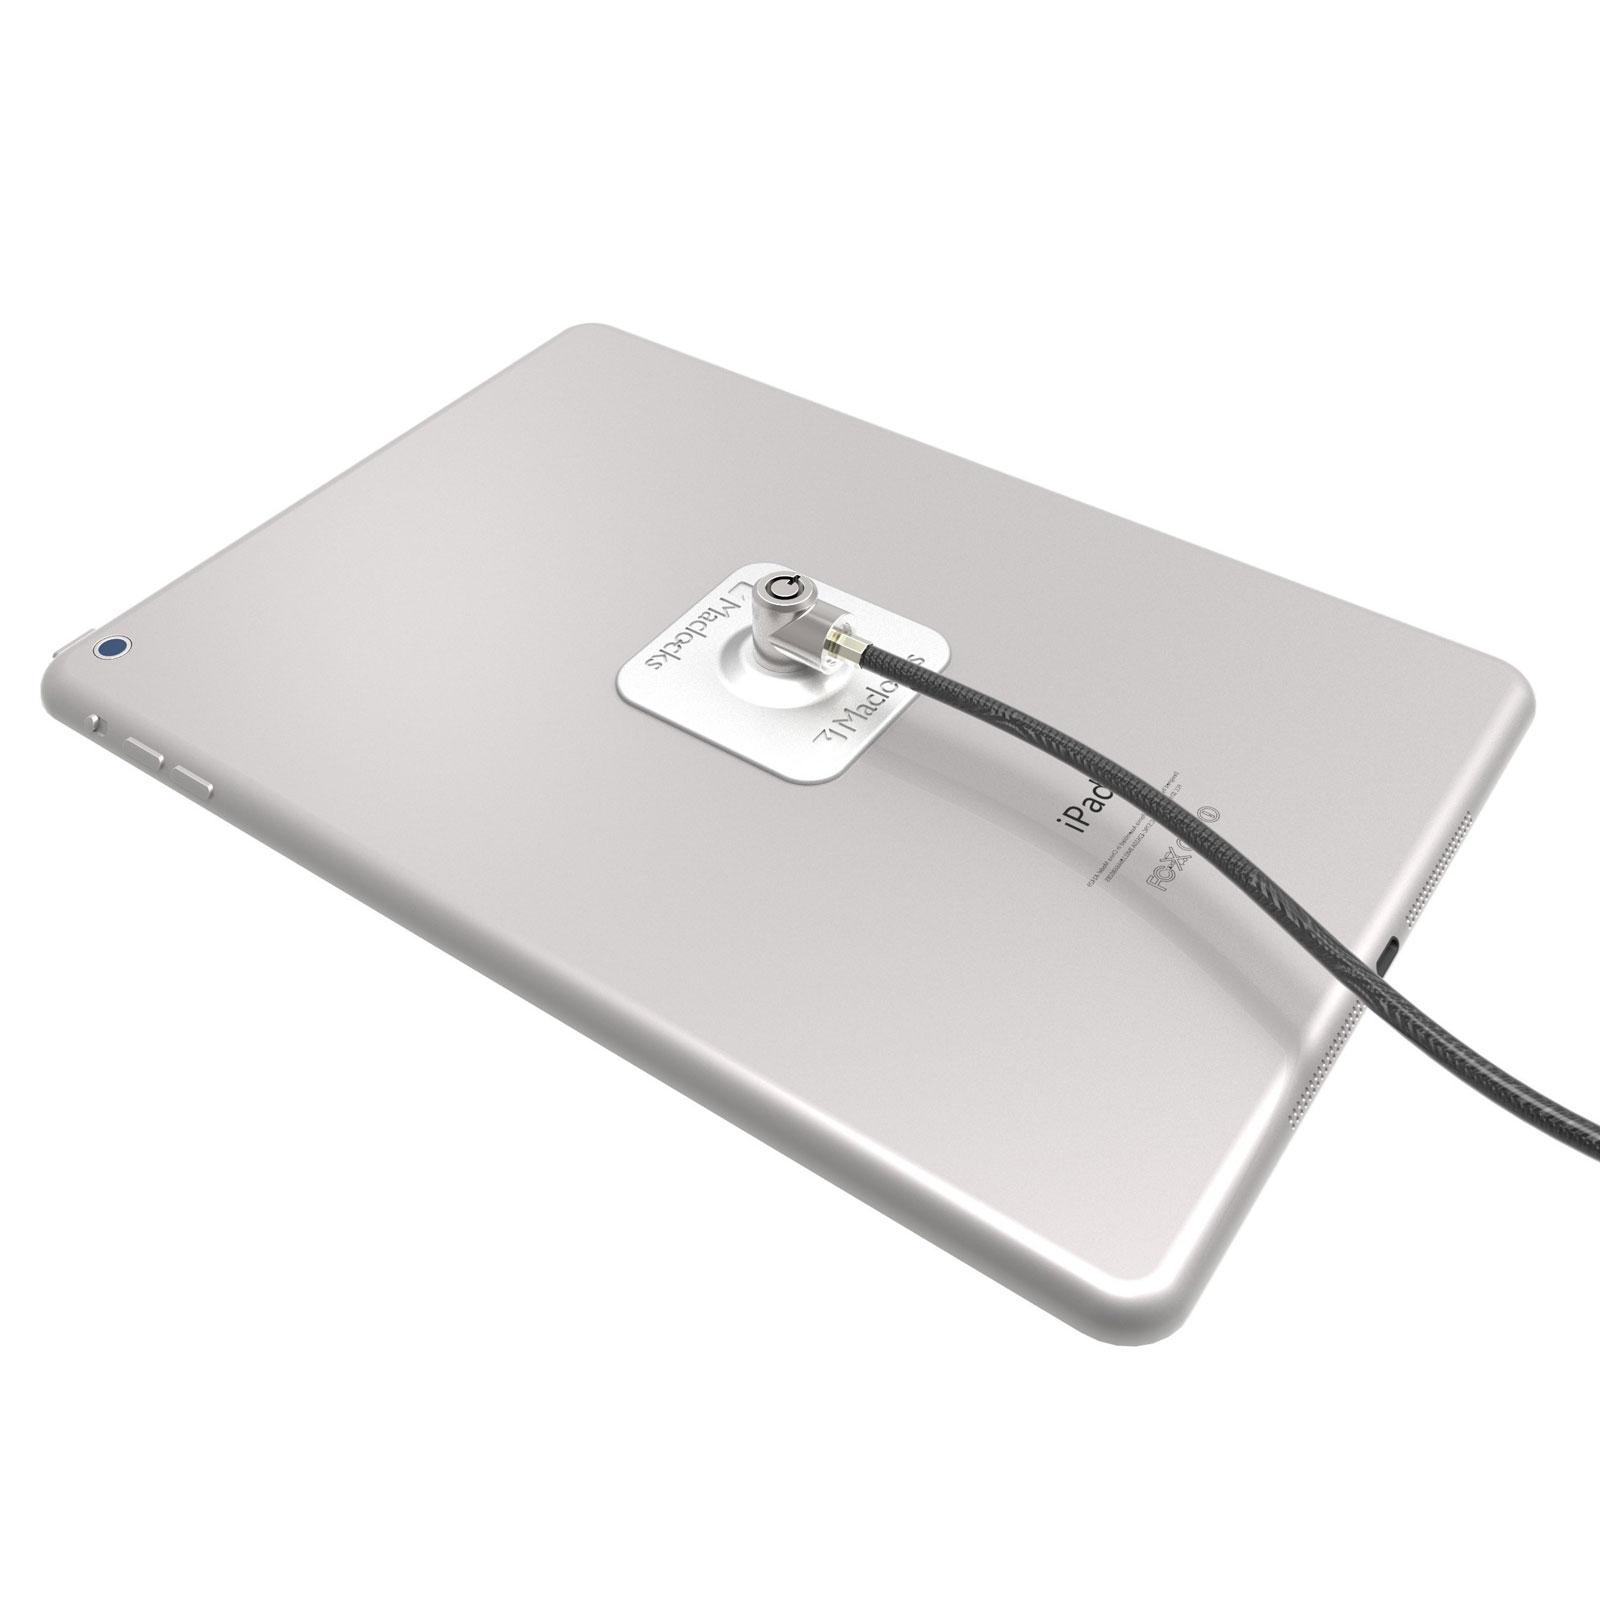 maclocks universal tablet lock antivol tablette maclocks sur. Black Bedroom Furniture Sets. Home Design Ideas